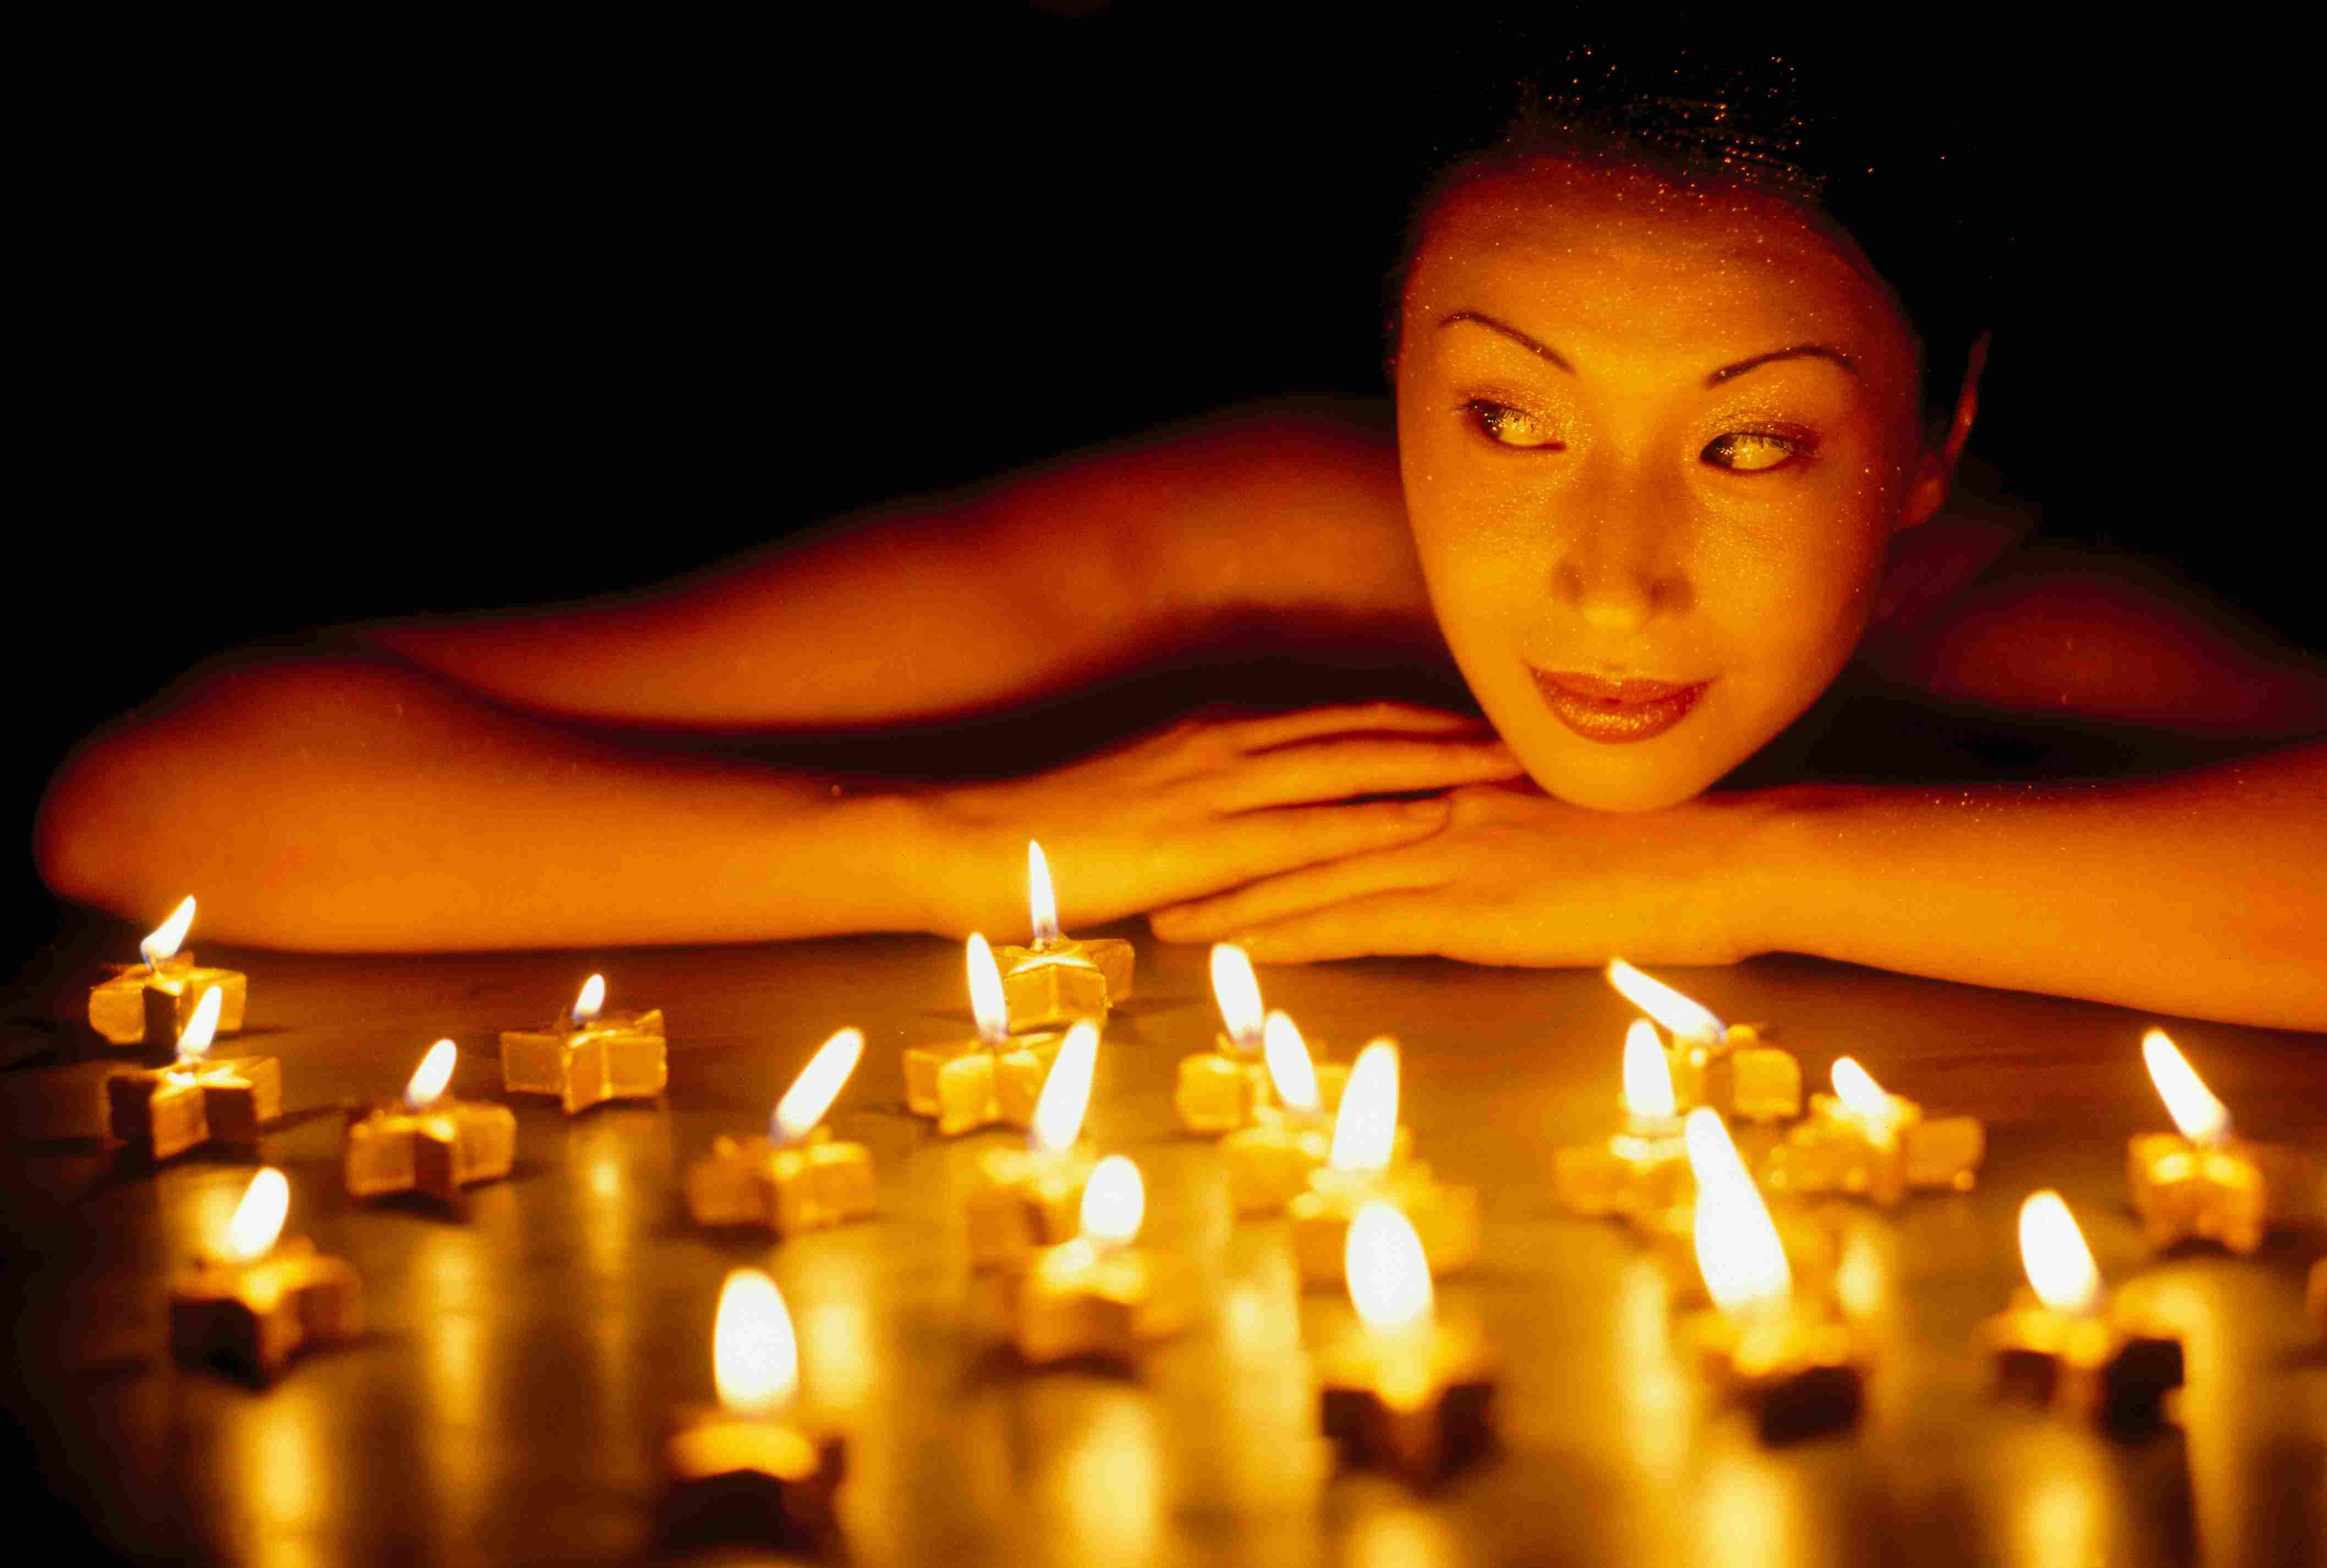 Woman looking at candles